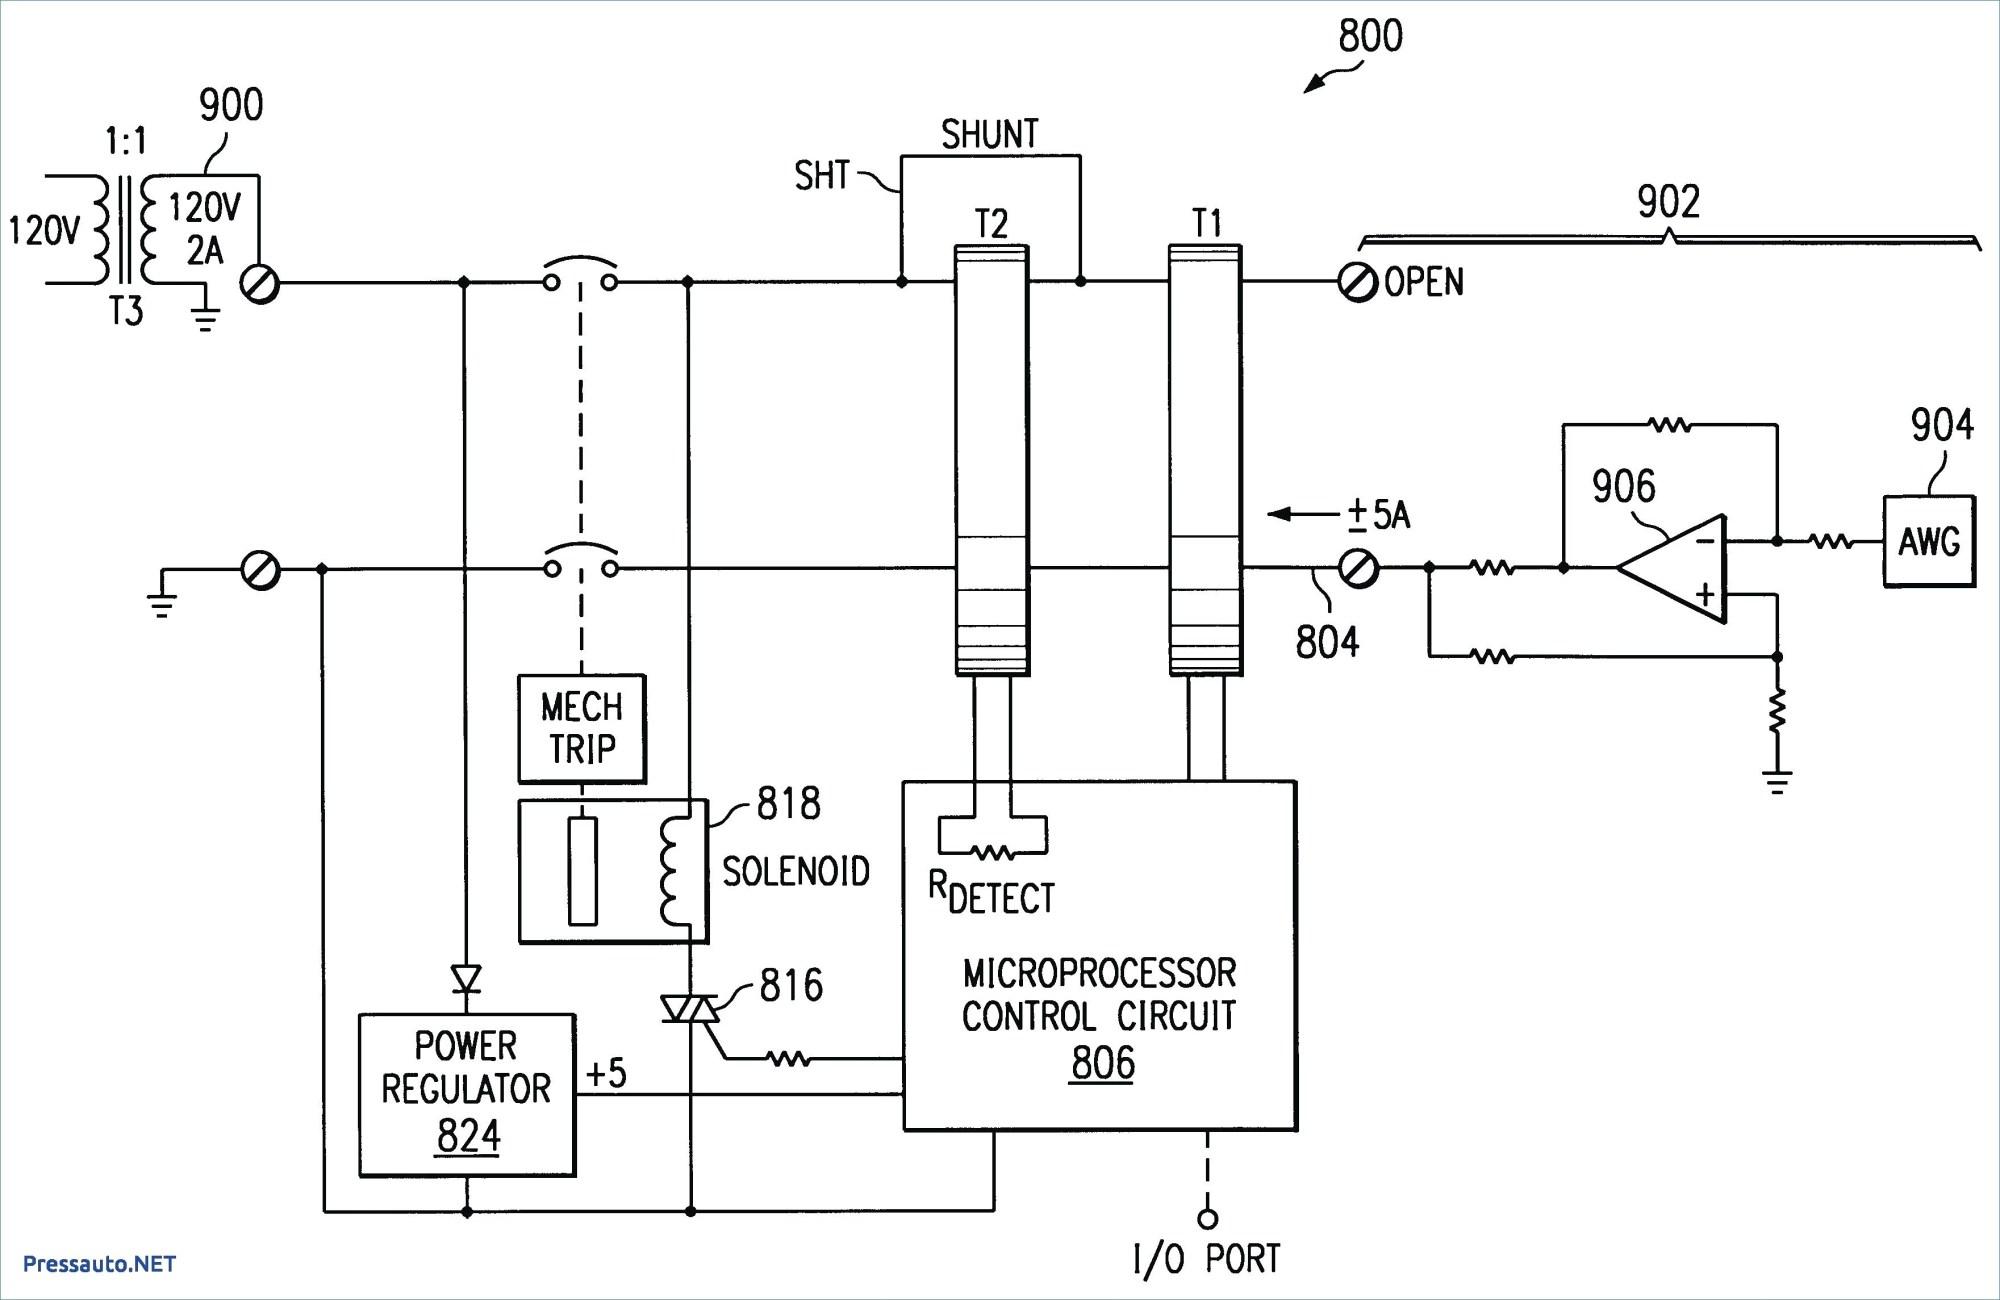 hight resolution of siemens shunt trip breaker wiring diagram free wiring diagramshunt trip breaker wiring diagram 10